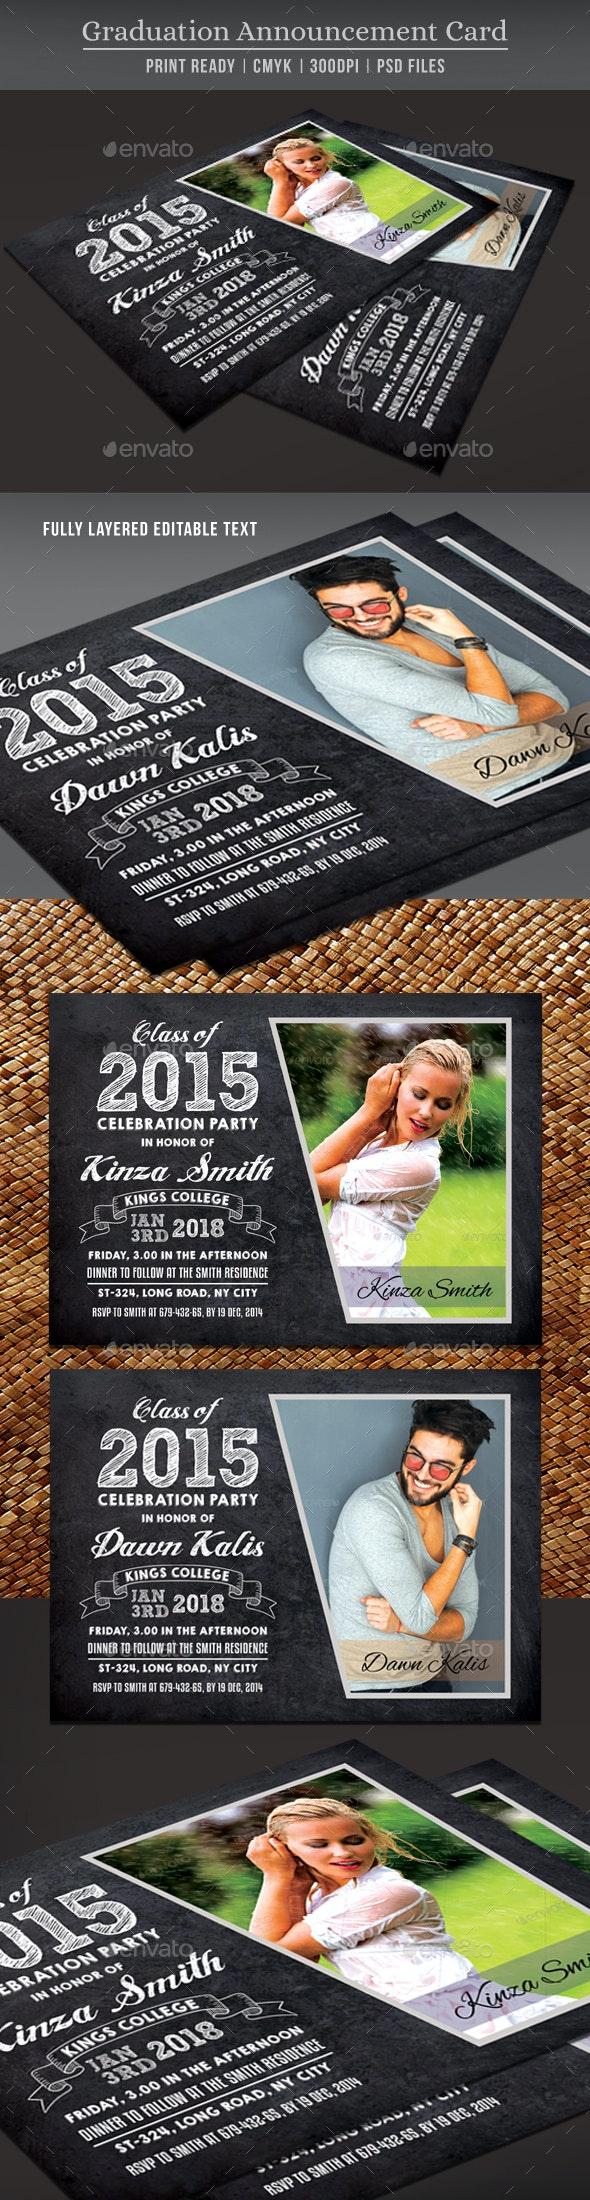 Graduation Announcement Card - Invitations Cards & Invites